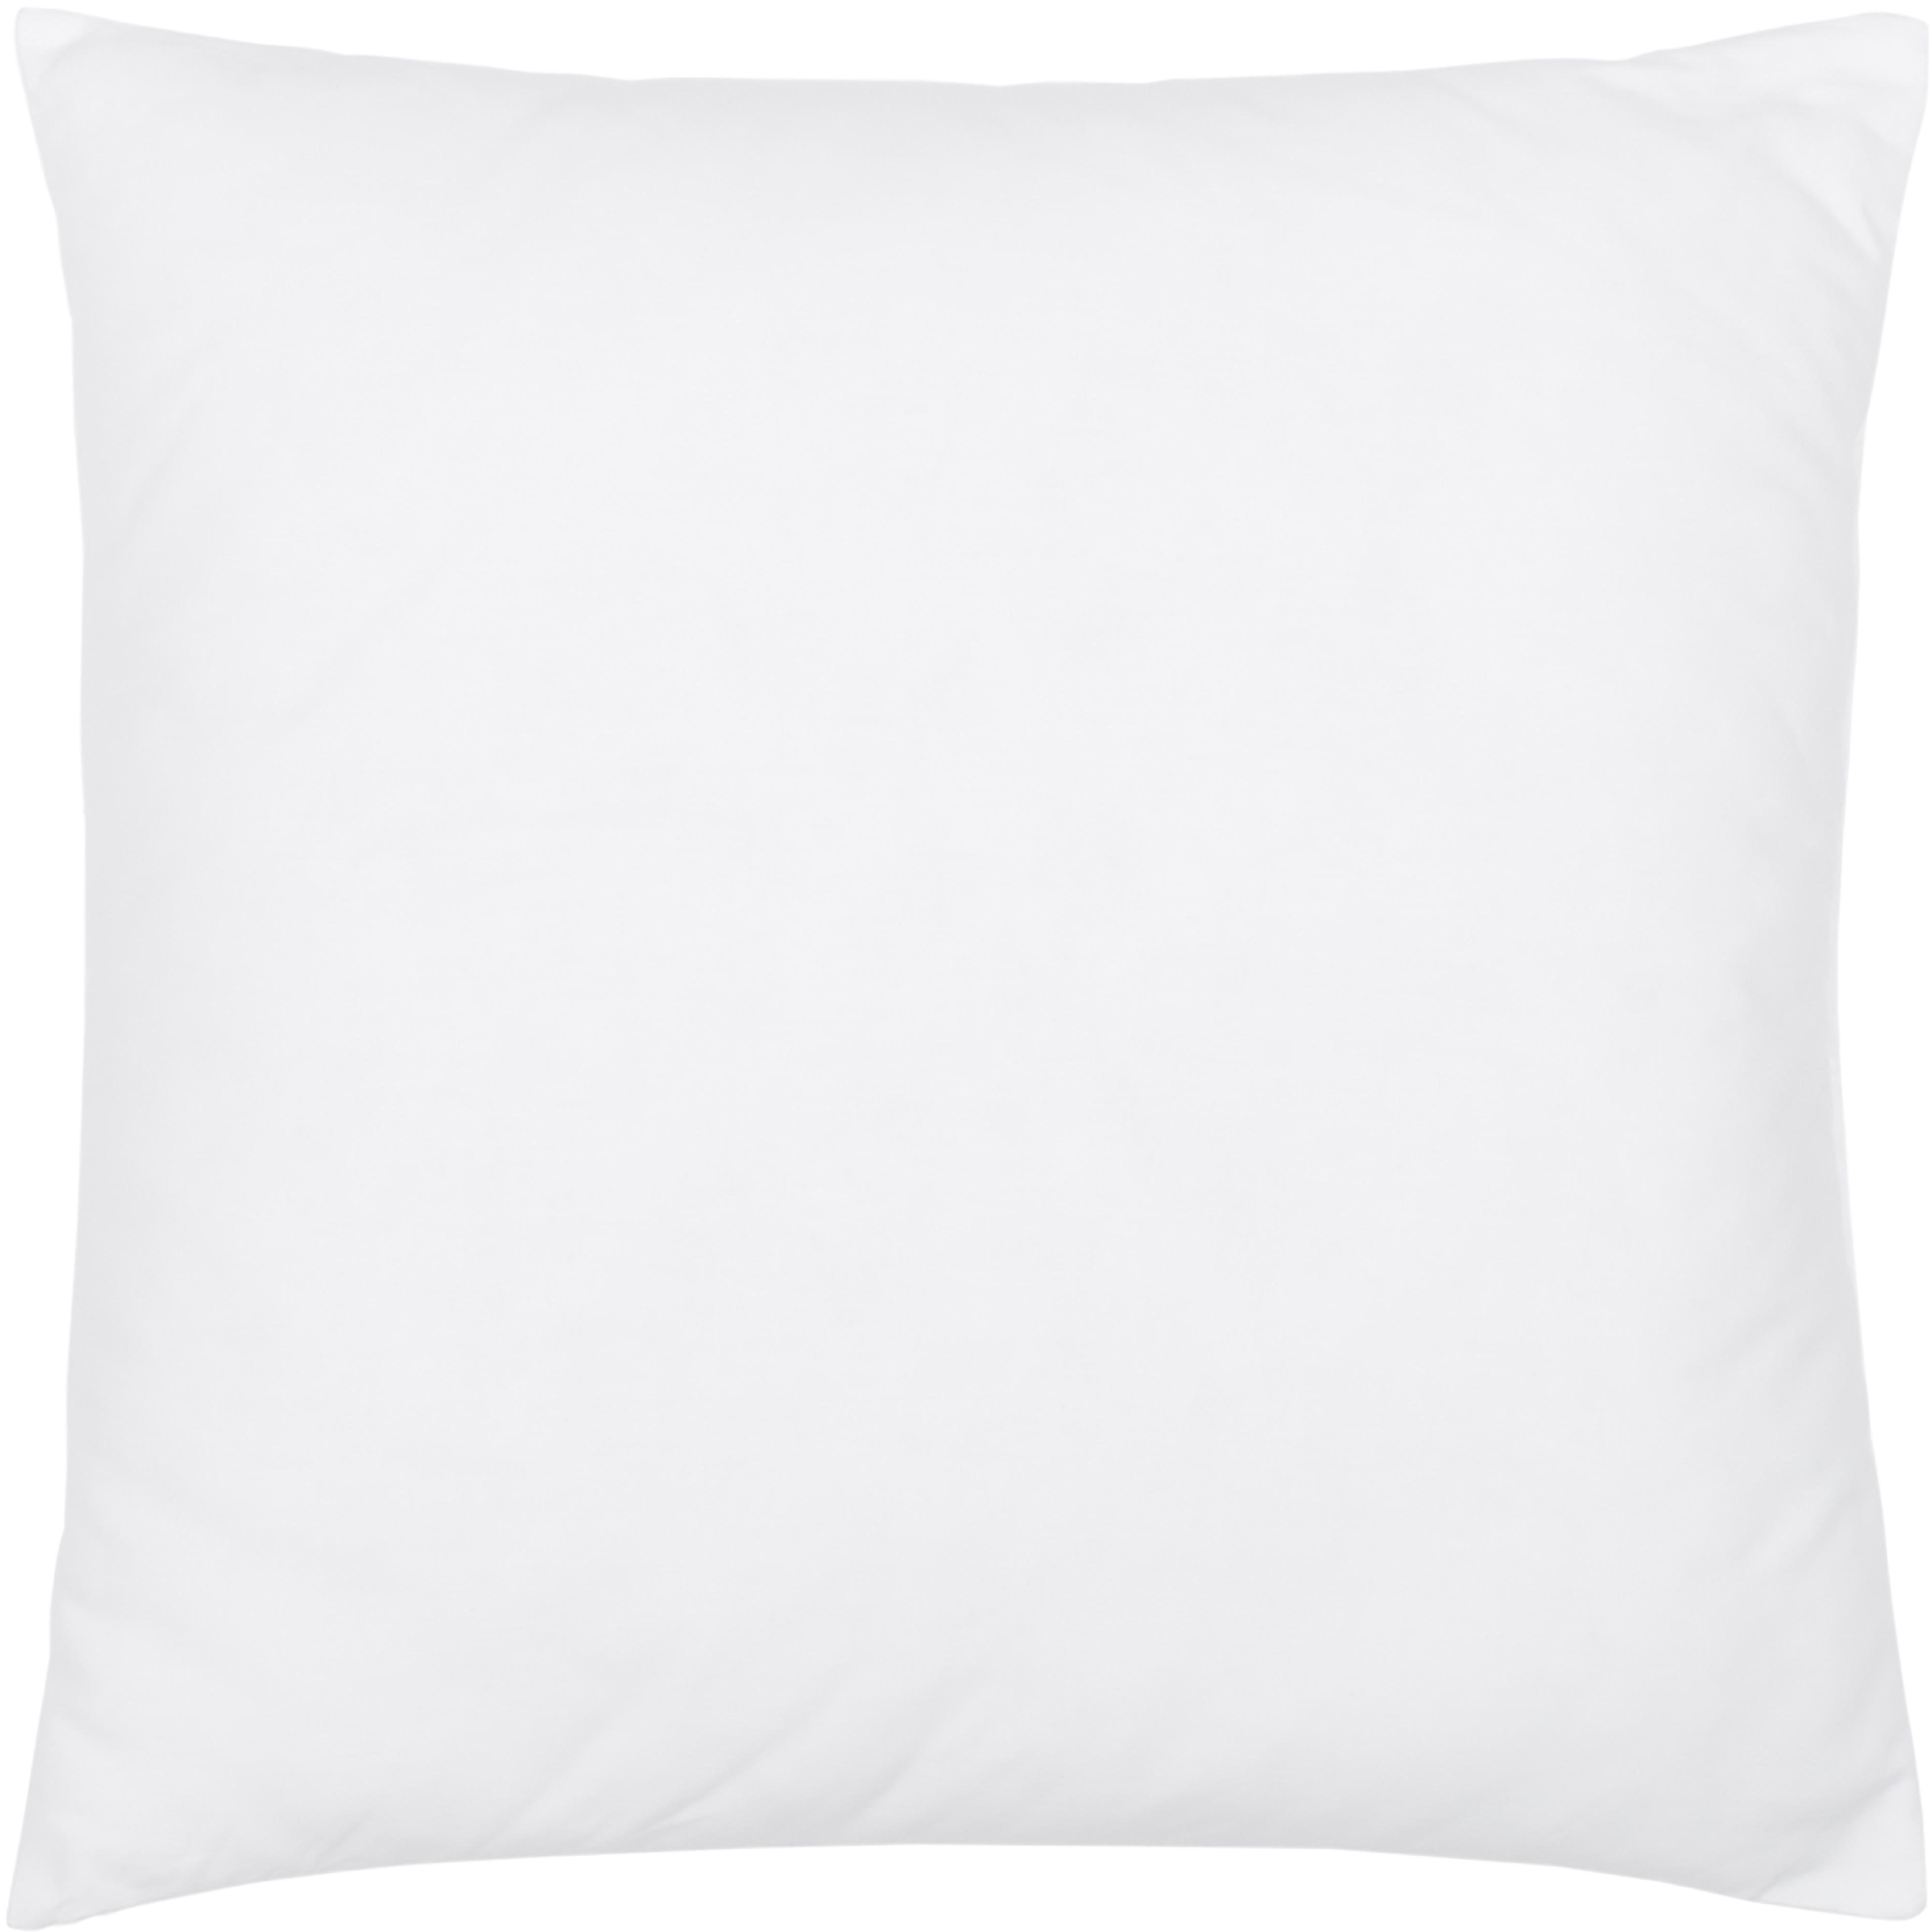 Relleno de cojín de microfibras Sia, 60x60cm, Funda: 100%algodón, Blanco, An 60 x L 60 cm